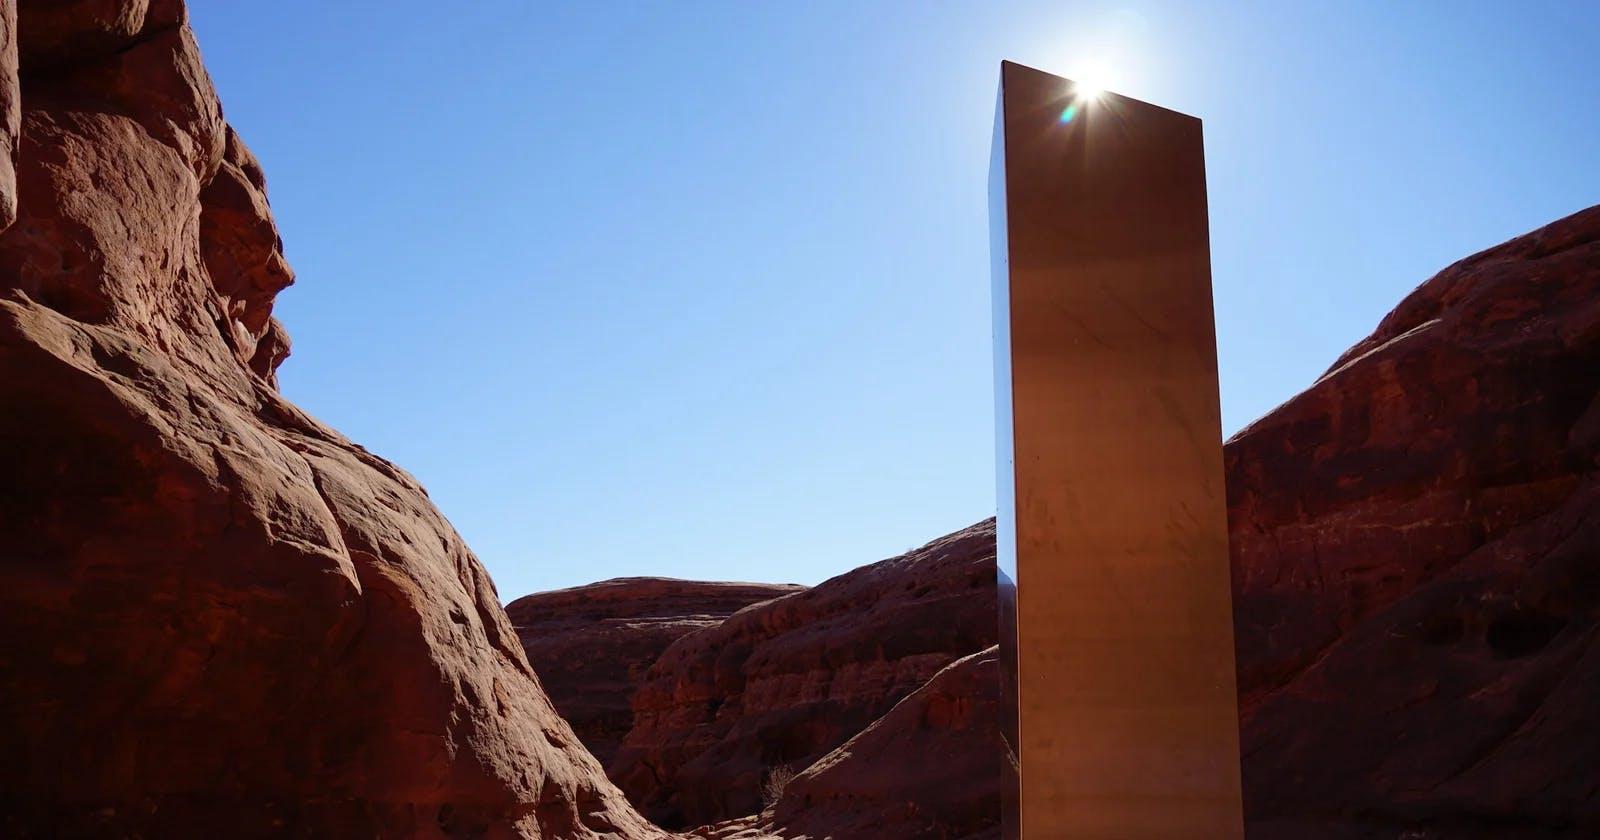 Meshing a modern monolith